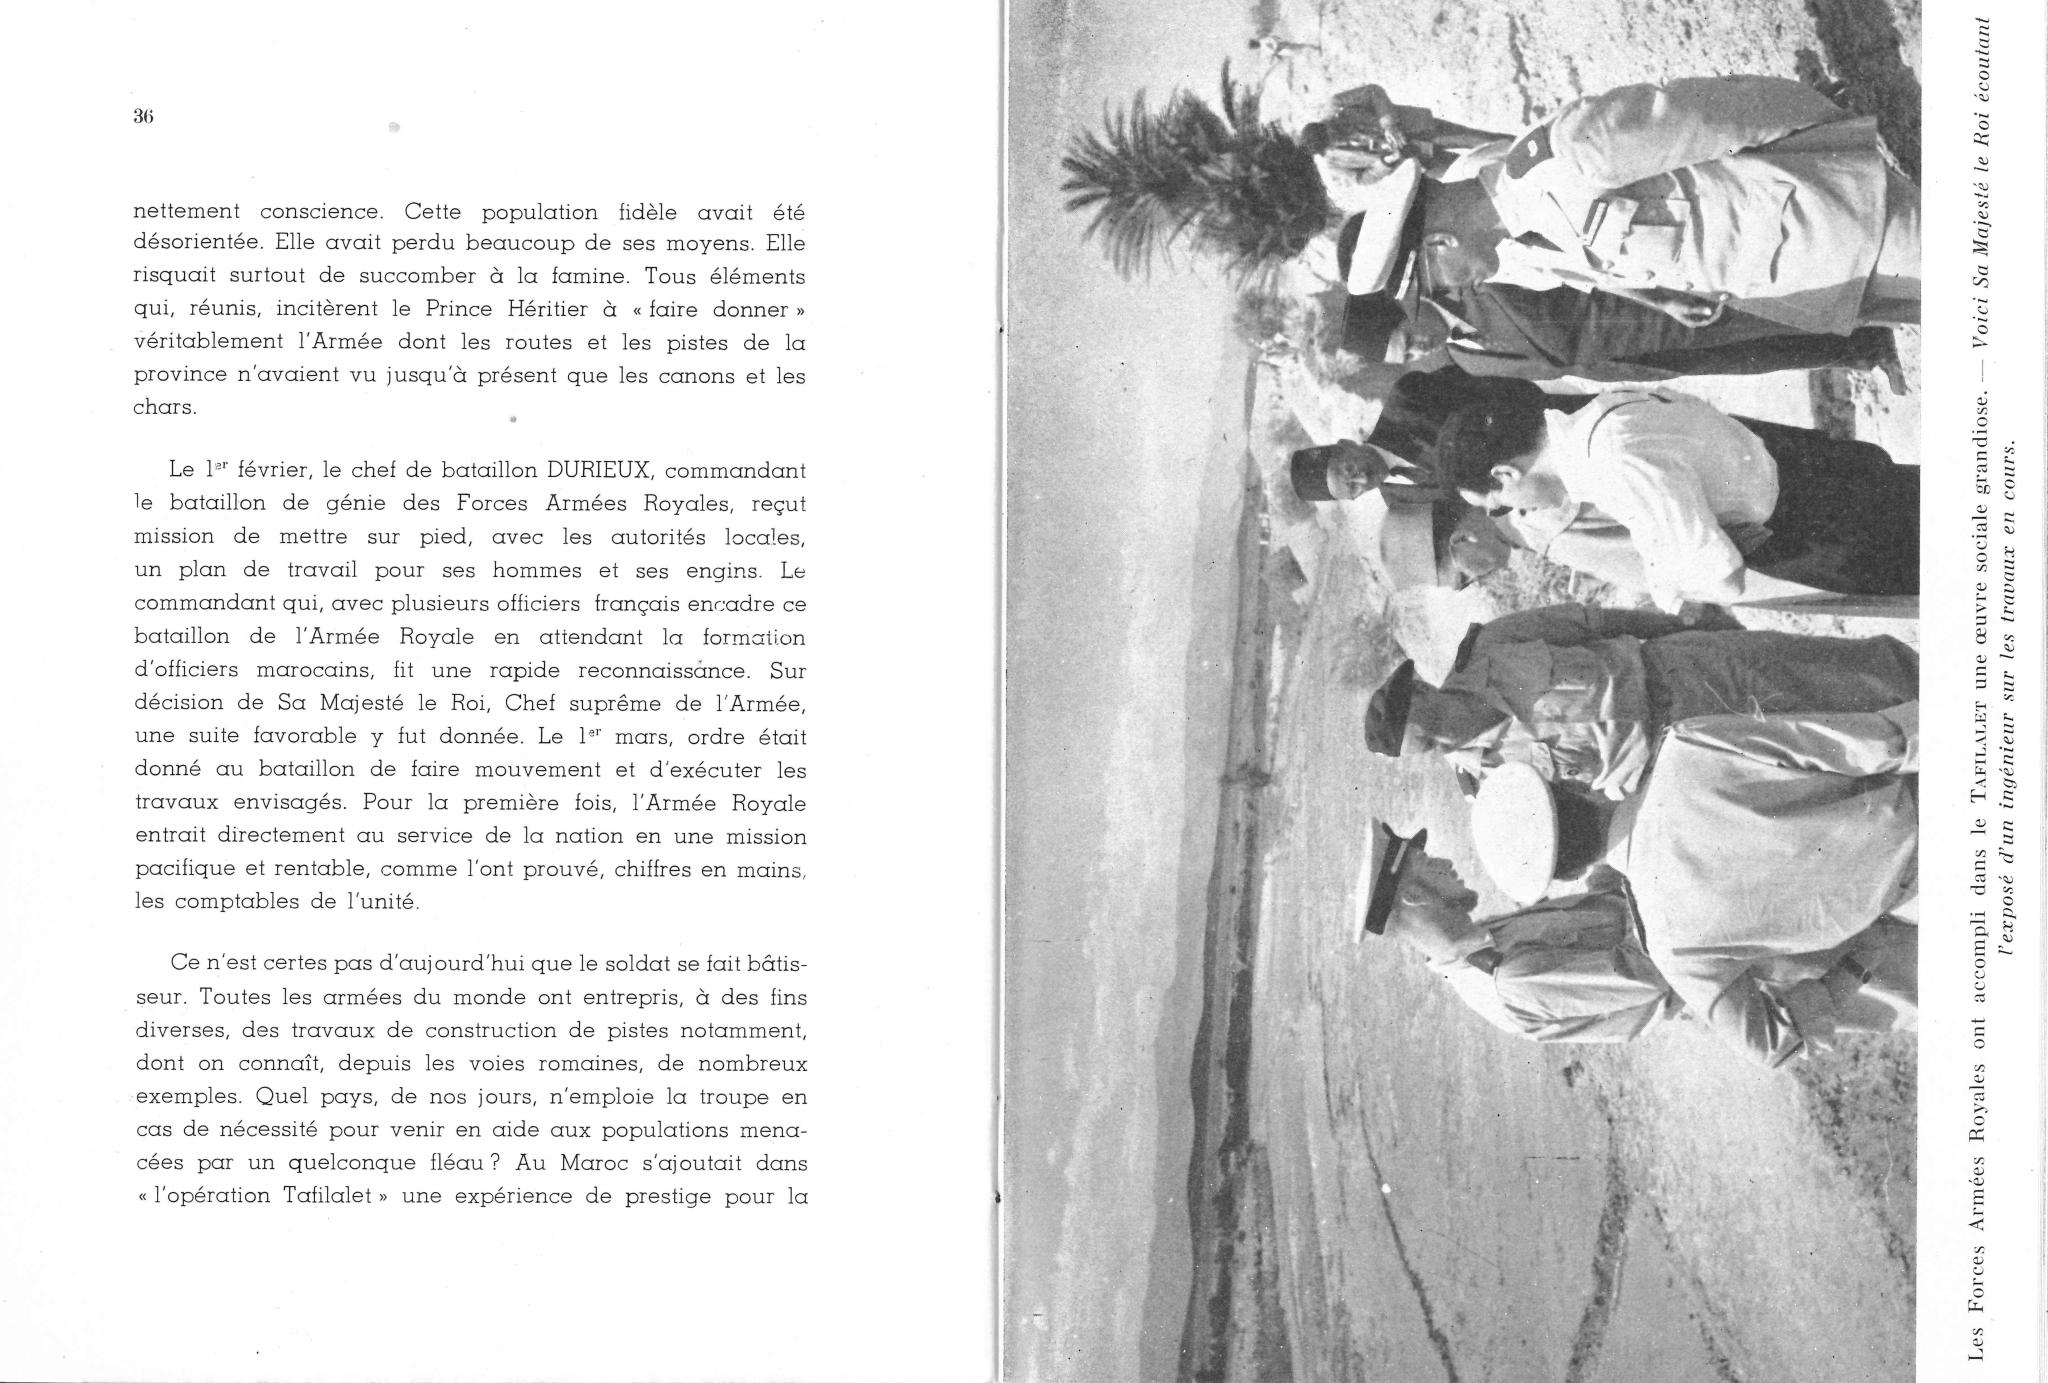 1957 - Les Forces Armées Royales  48642433296_4a38ac78be_o